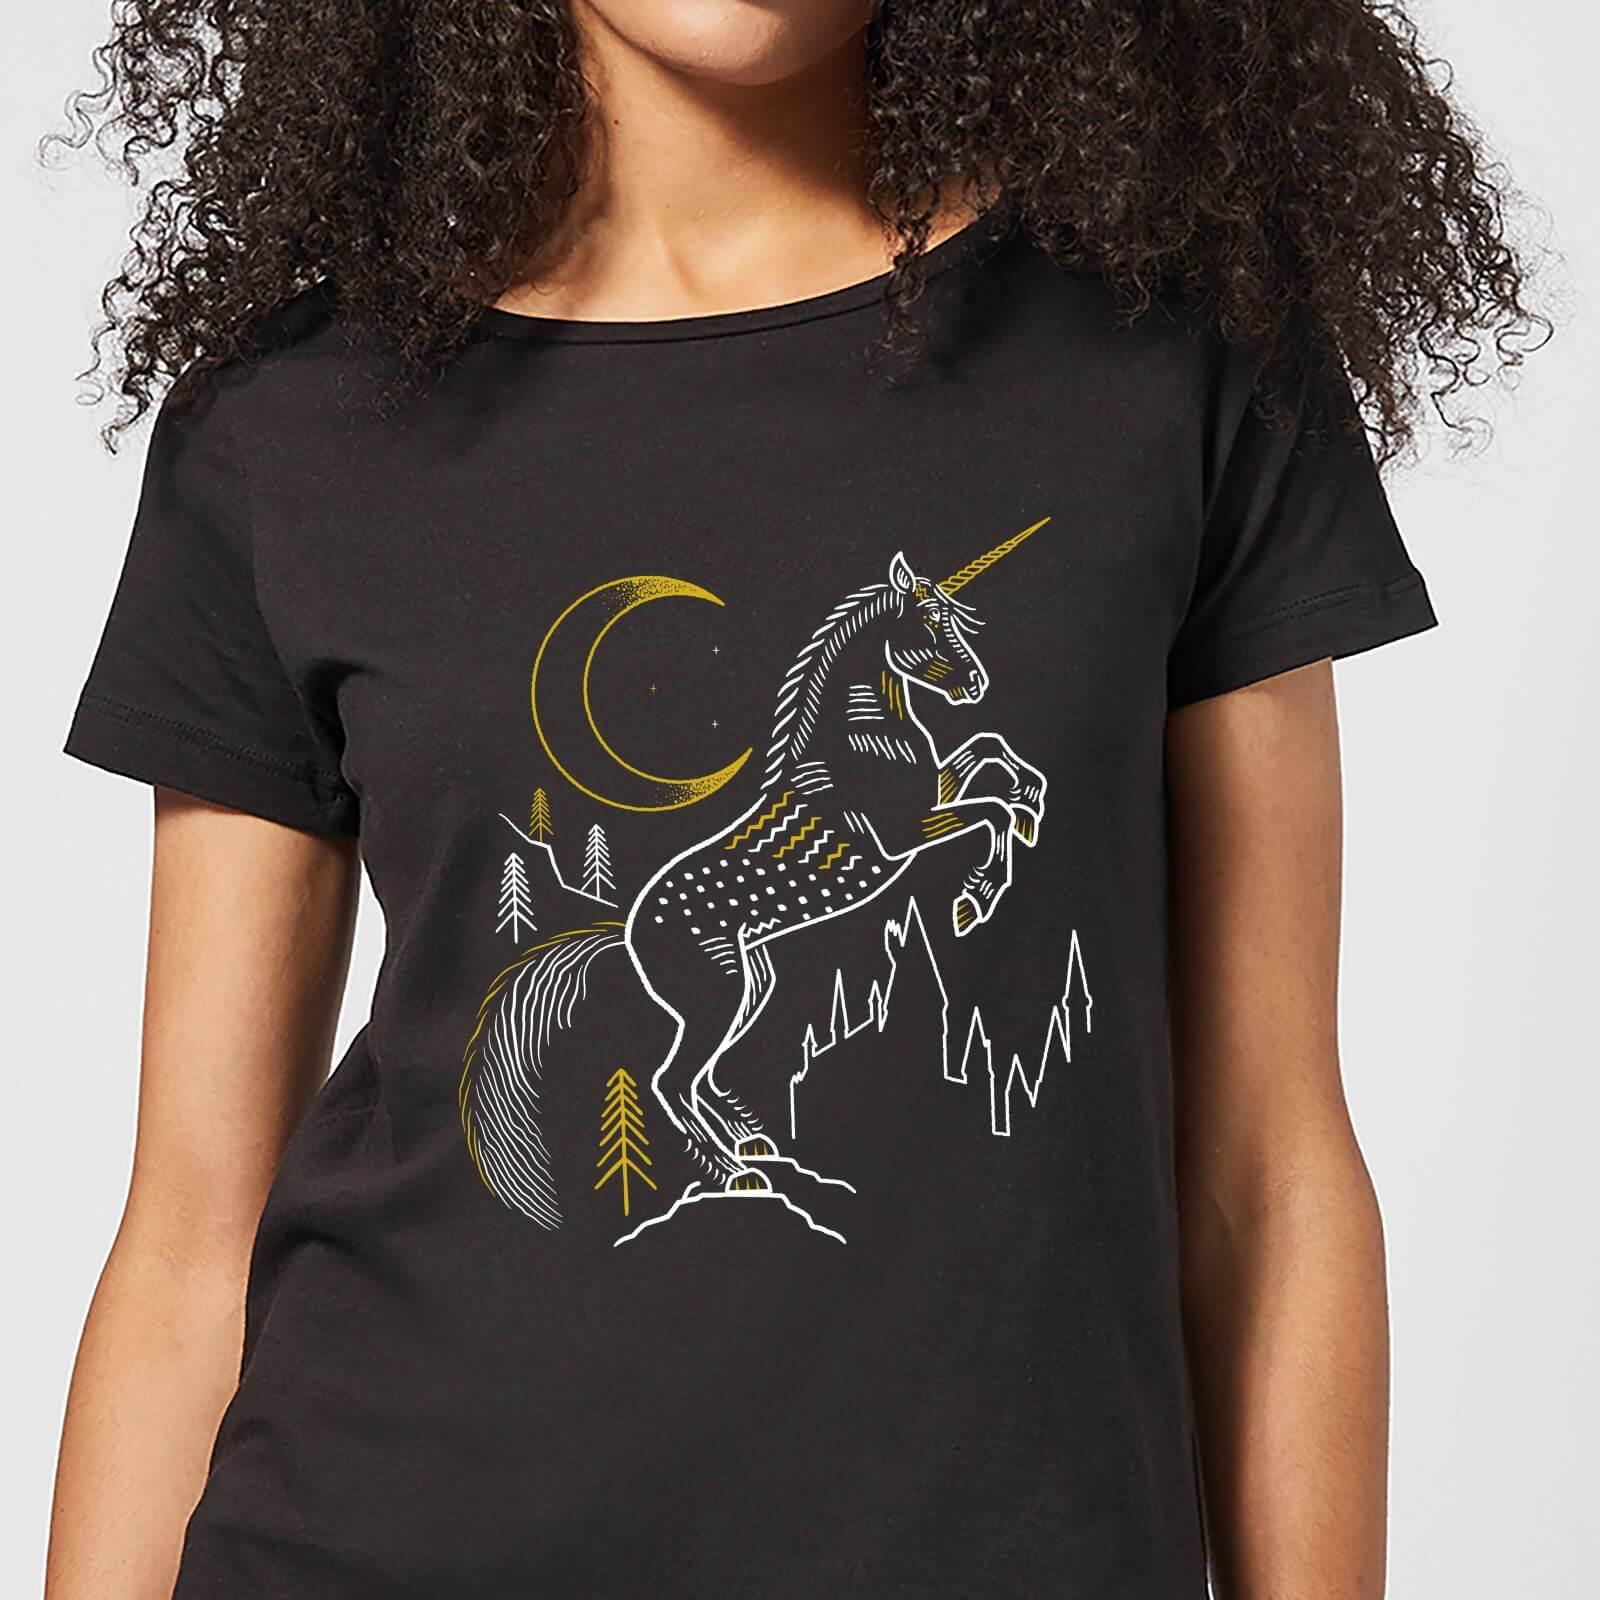 Harry Potter Unicorn Women's T-Shirt - Black - 4XL - Schwarz